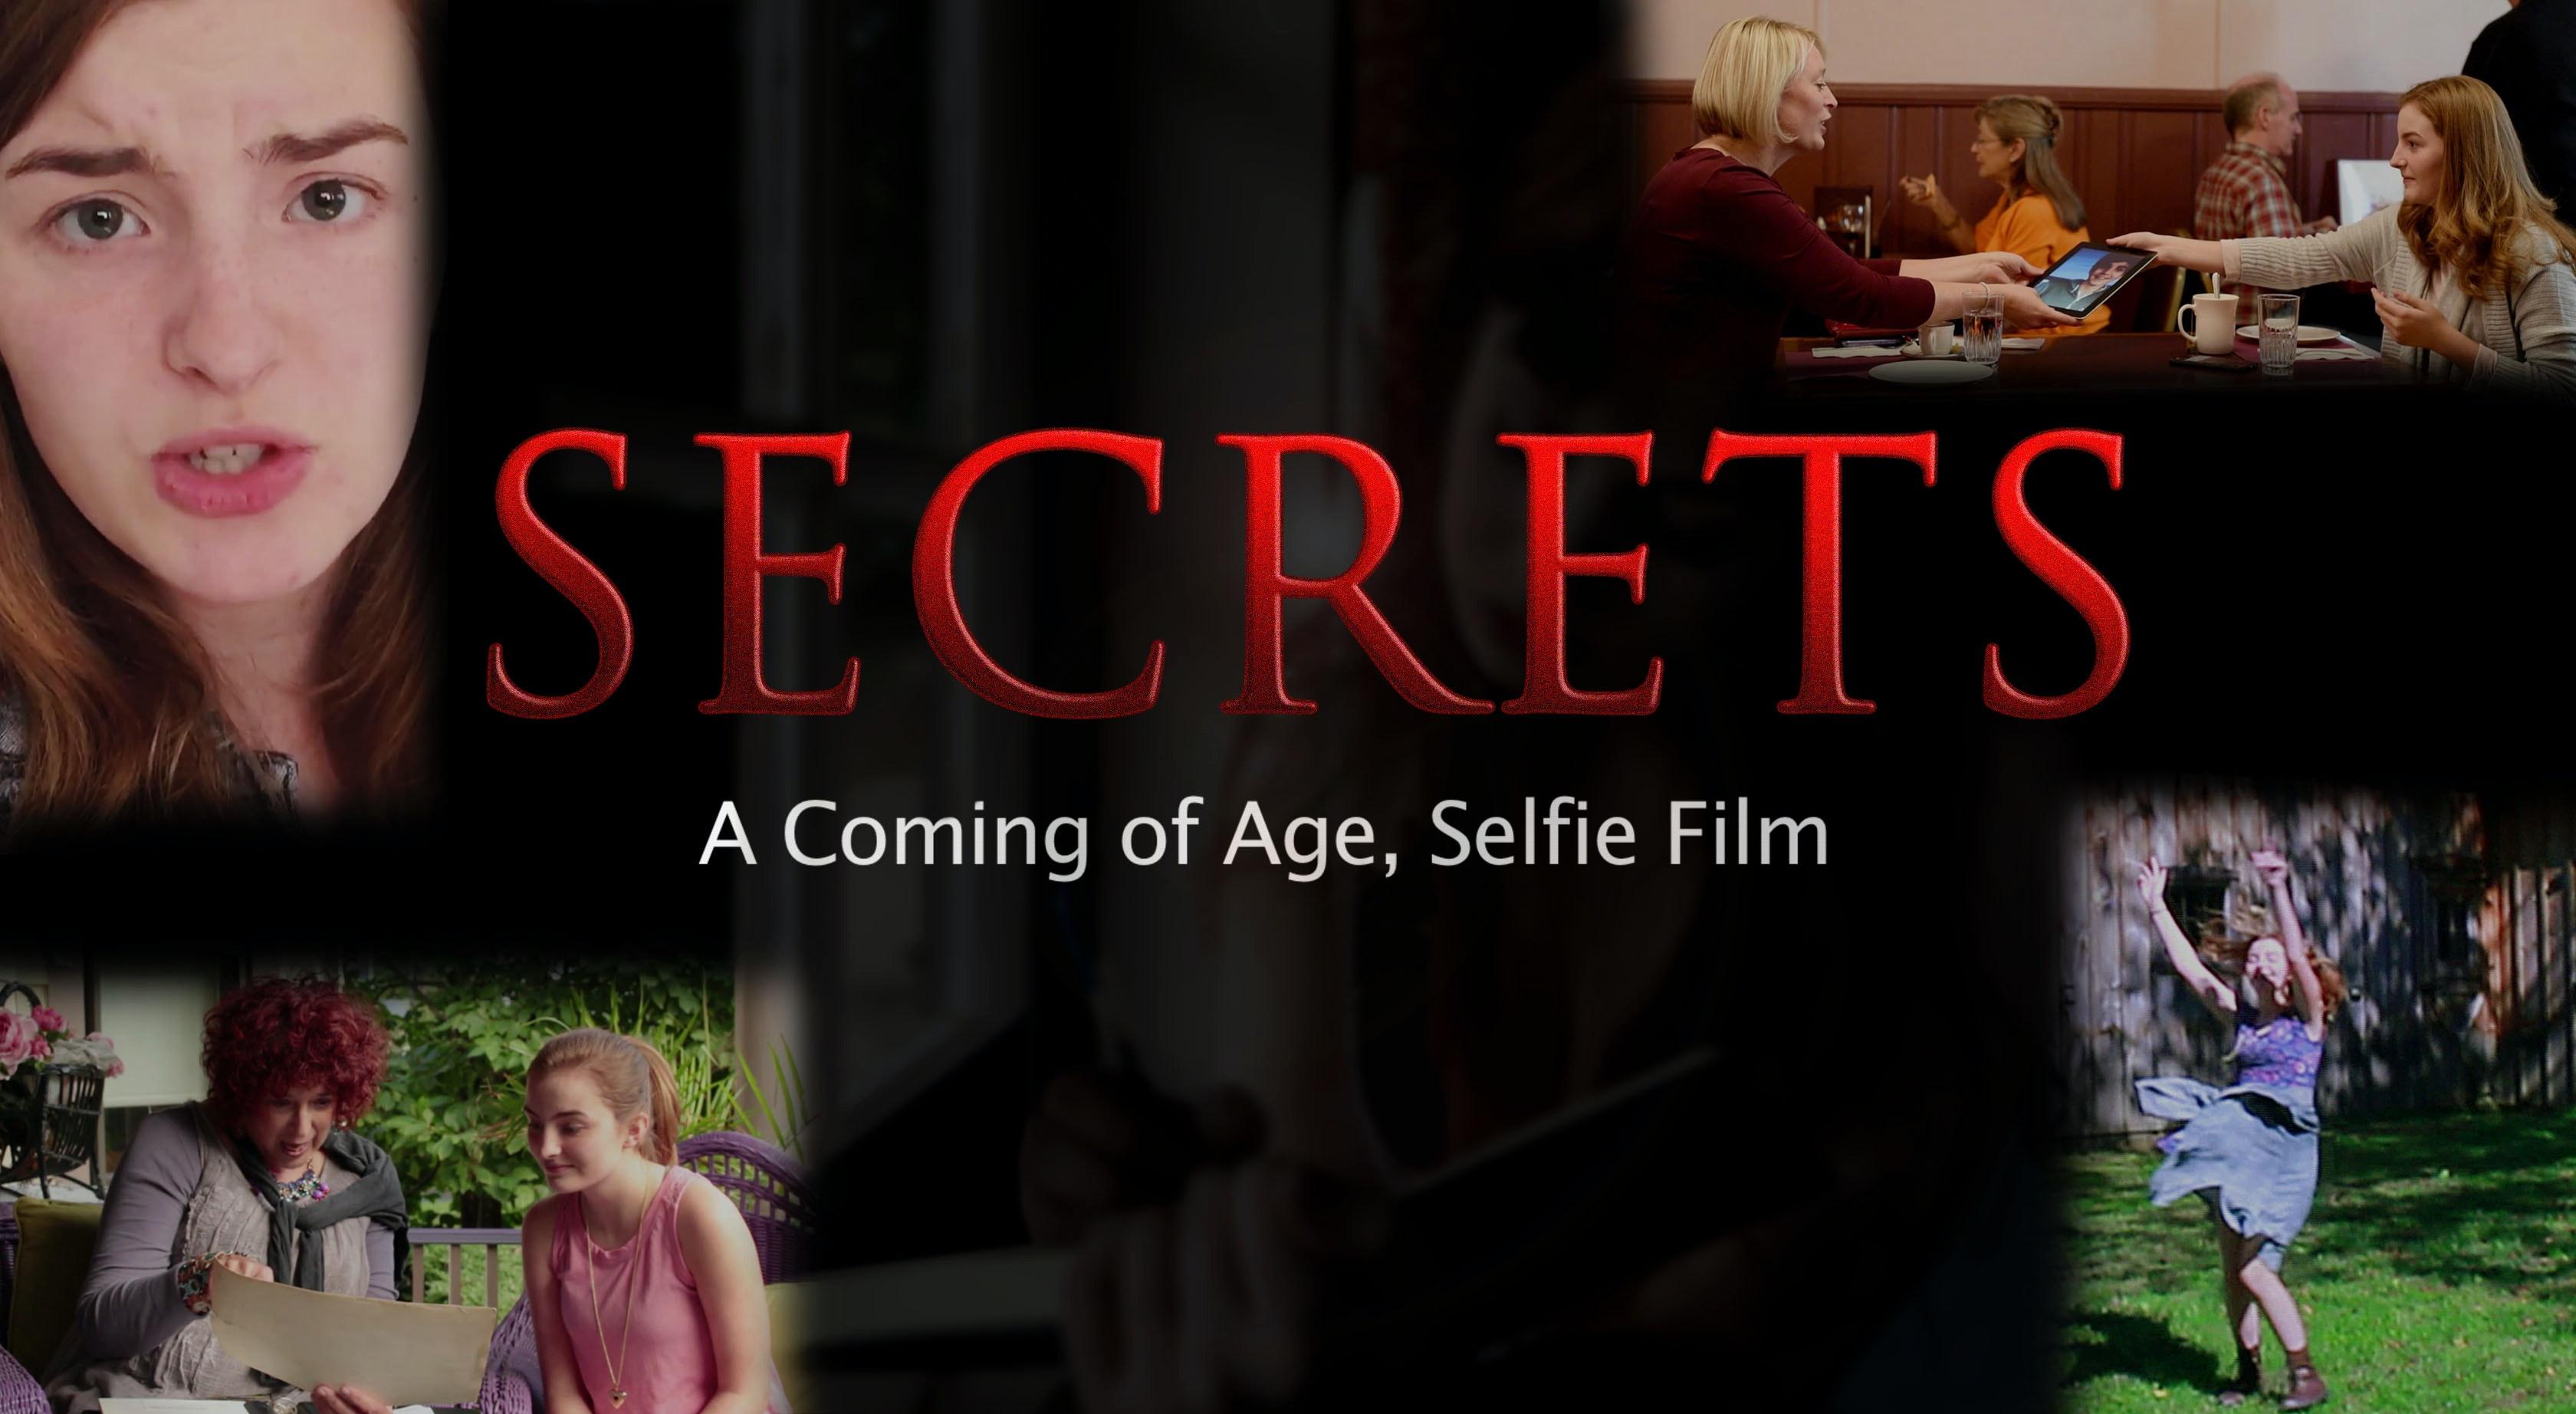 SECRETS: A Coming of Age Selfie Film